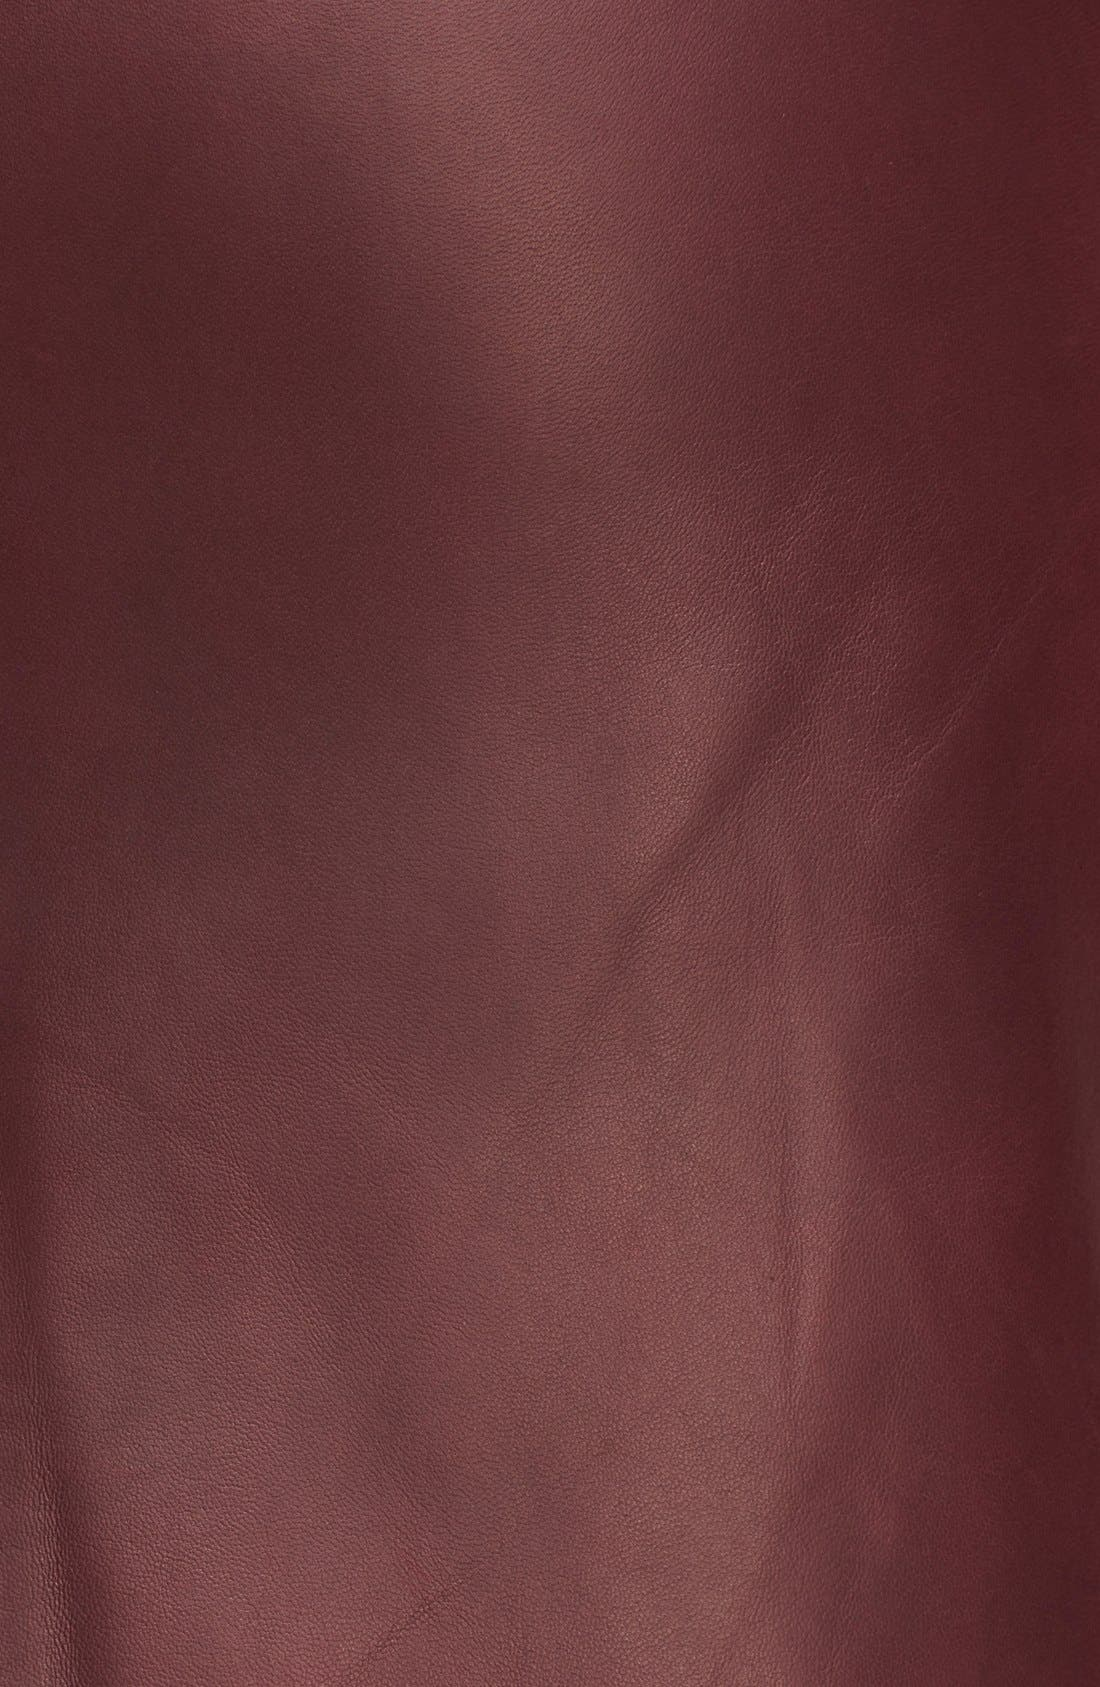 Alternate Image 3  - Alexander McQueen Leather Pencil Skirt